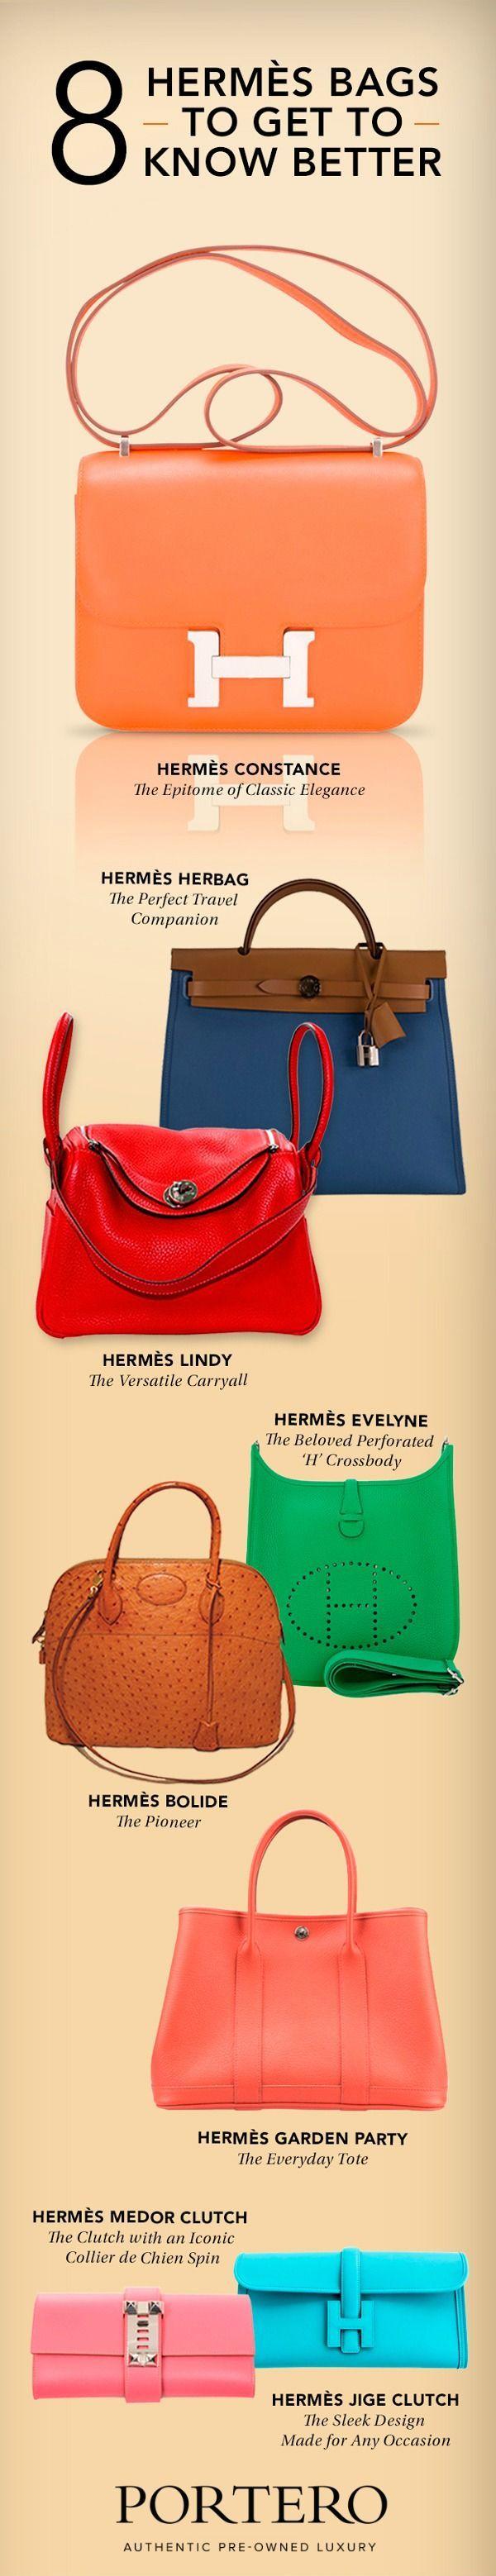 attractive handbags 2017 trends bags 2018 luxury handbag https://twitter.com/gaefaefagaea4/status/895099552956416000